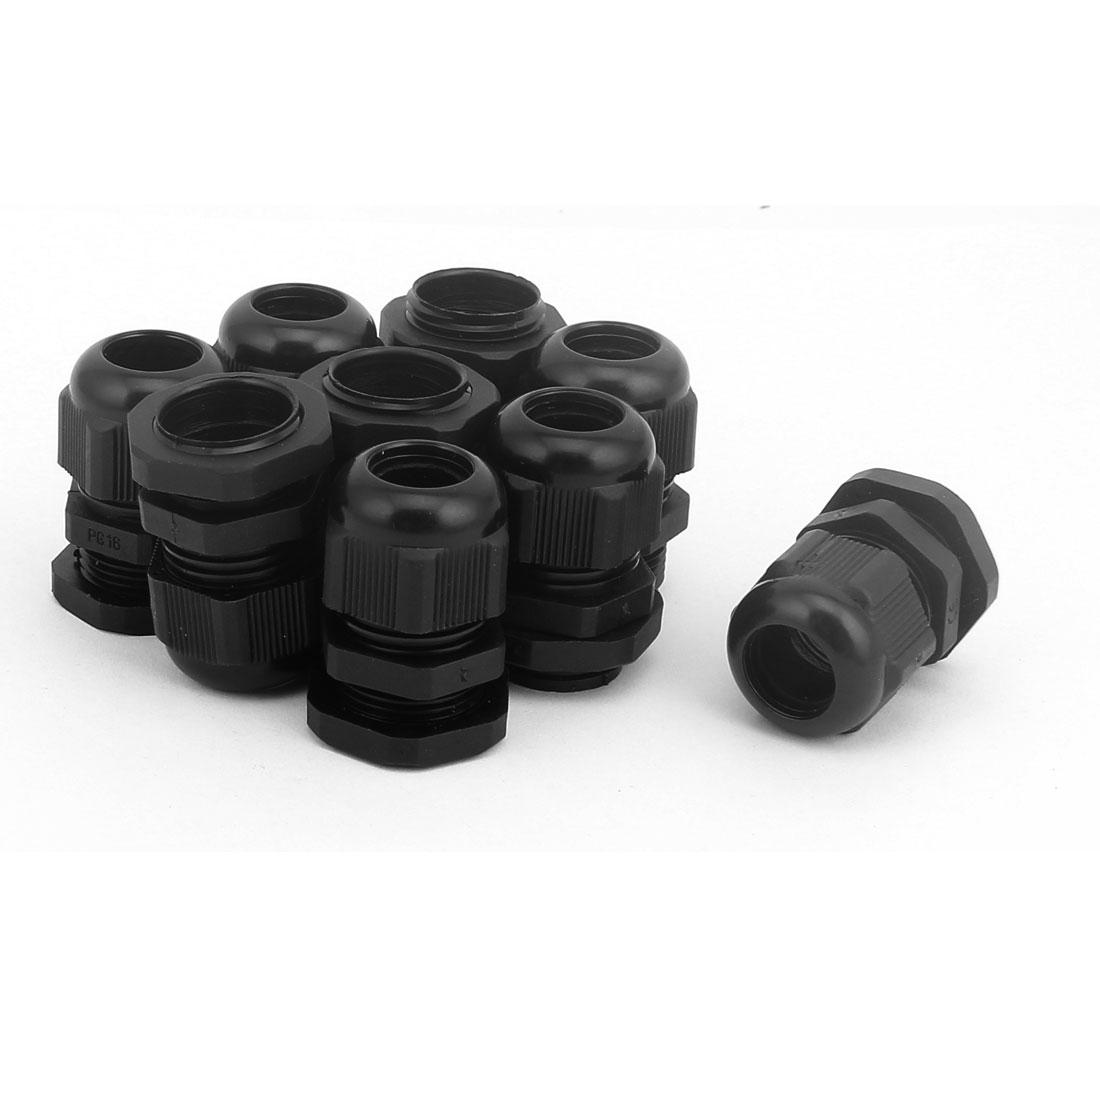 22mm OD Plastic Waterproof Connectors Cable Glands Connector 9 Pcs Black